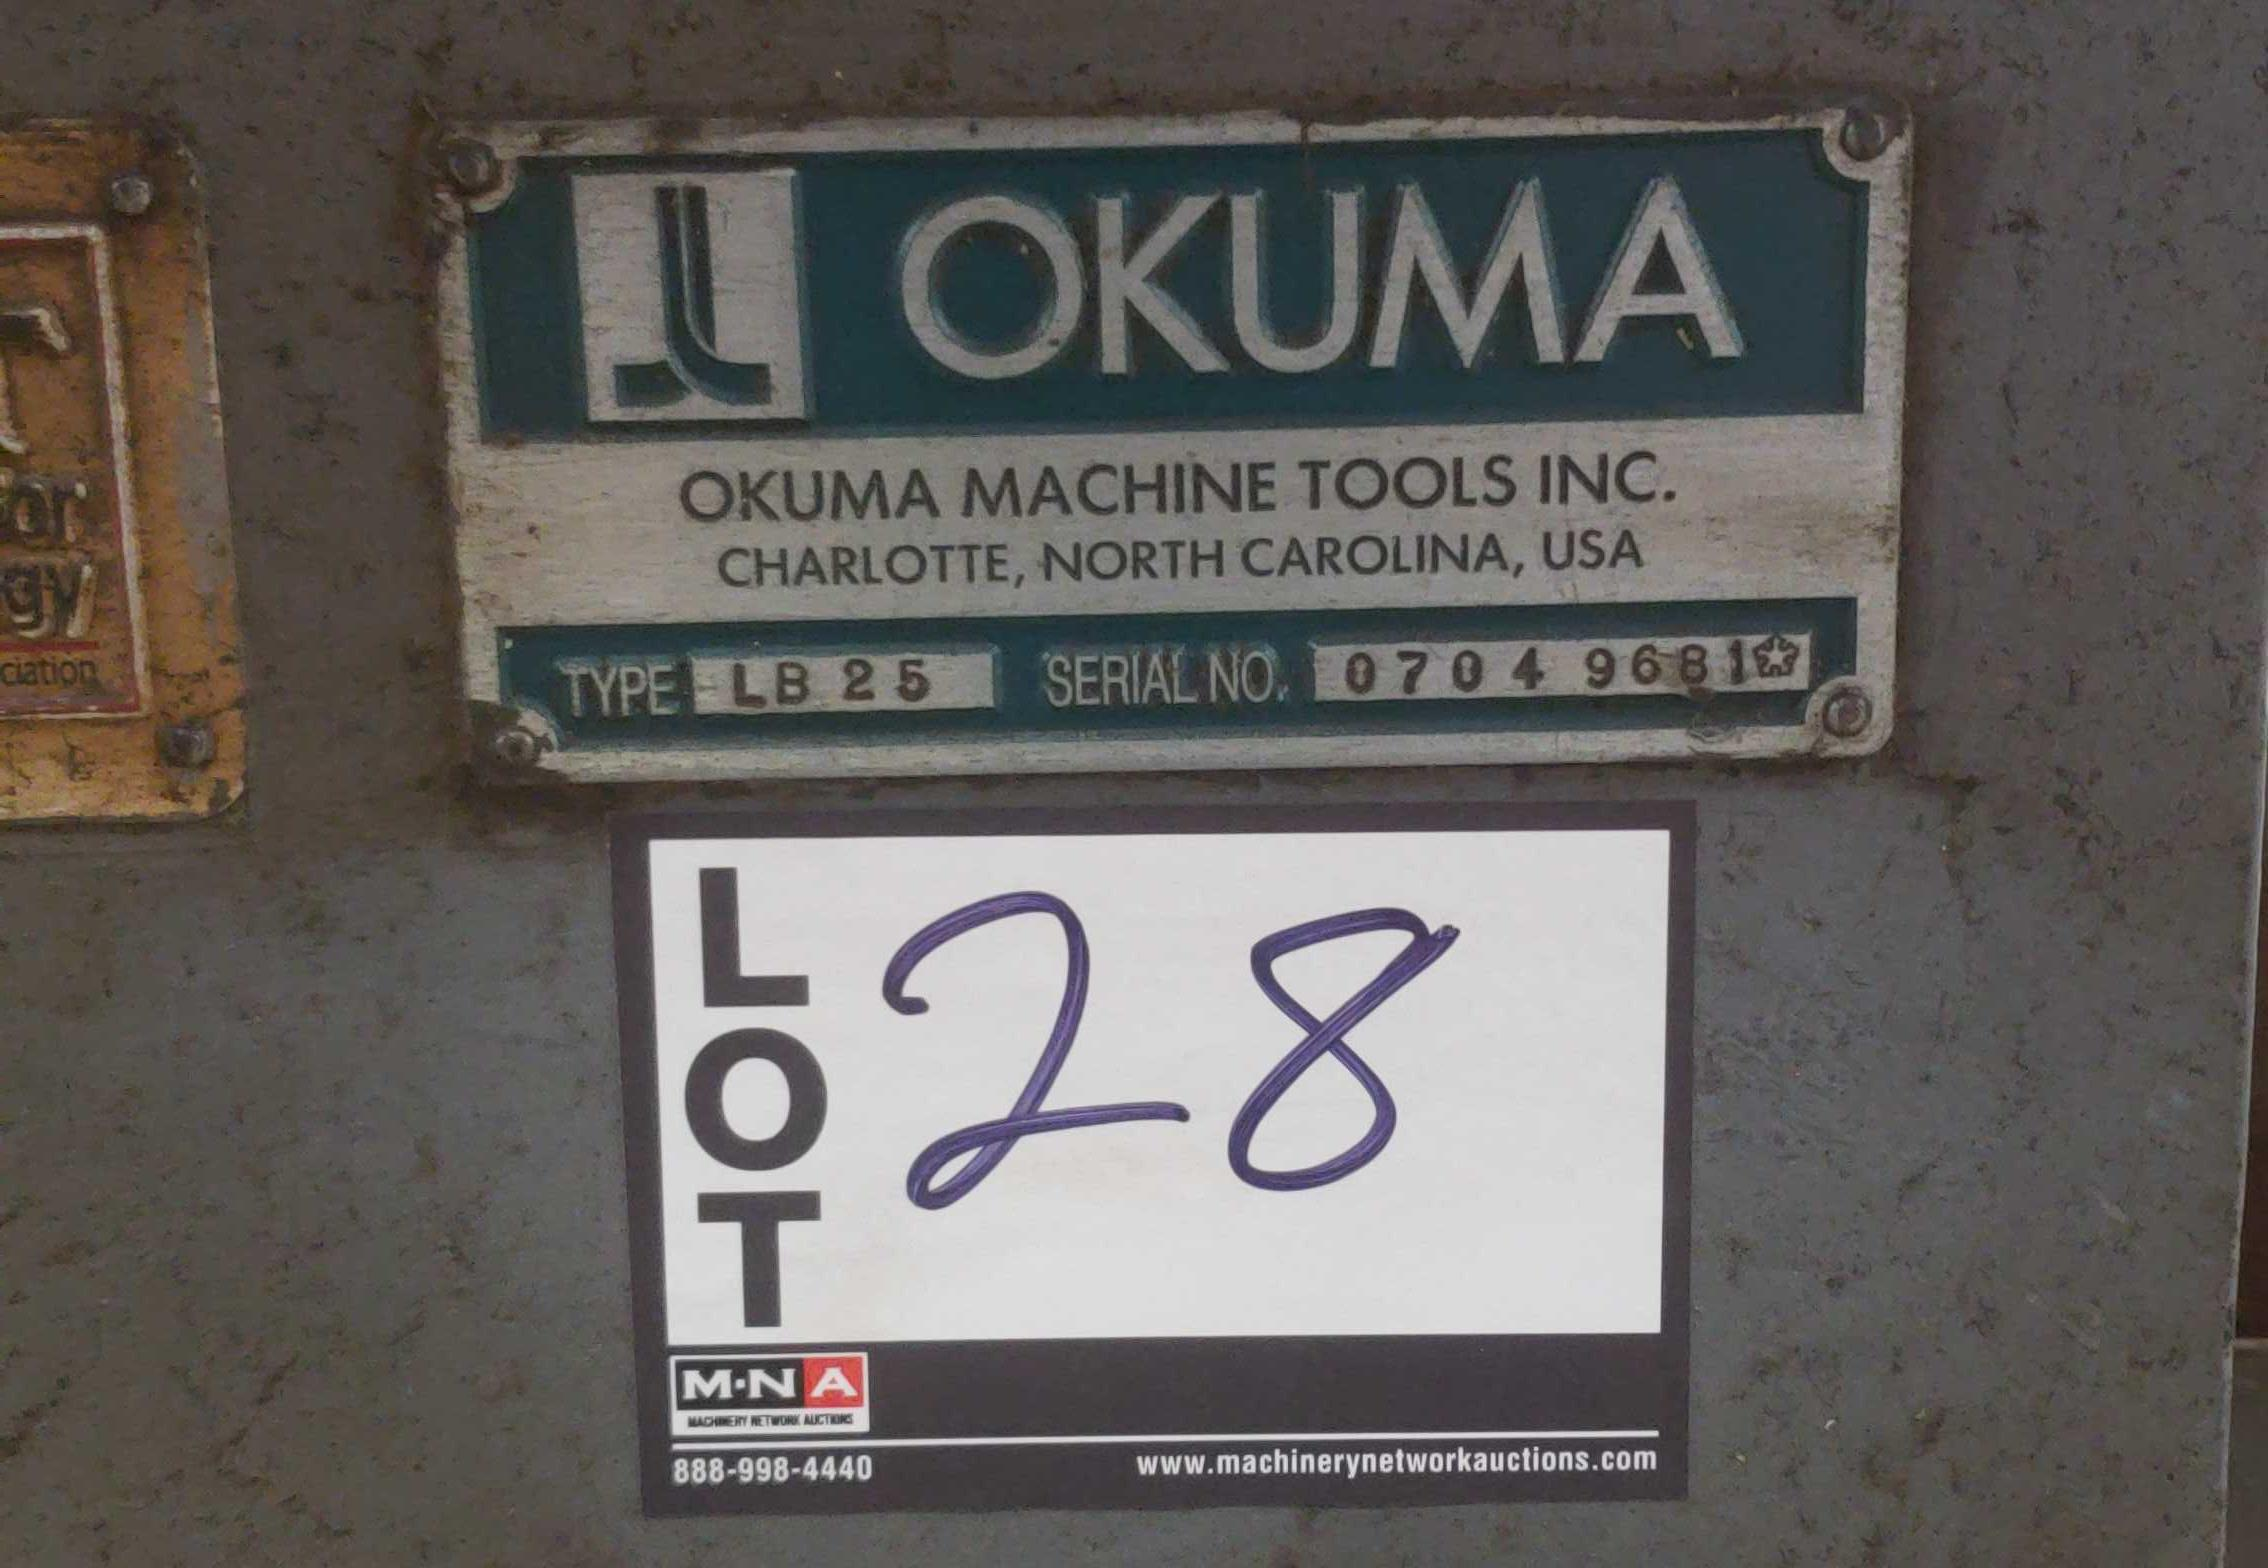 "Okuma LB 25 2 Axis CNC lathe, 5020 control, chip conveyor, 10"" chuck SN: 07049681 - Image 4 of 4"